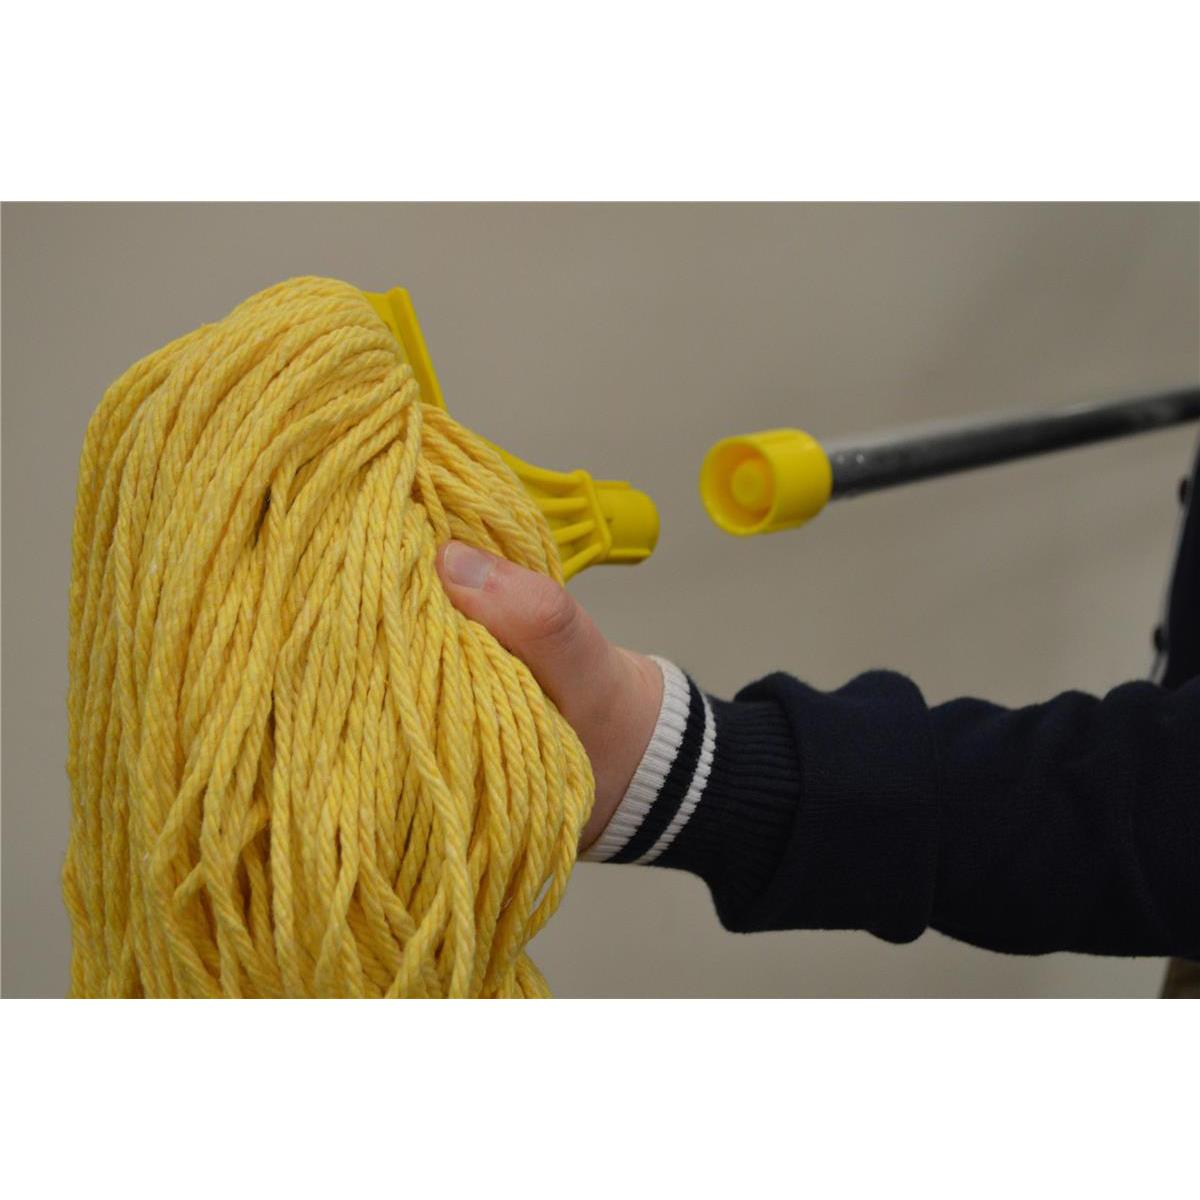 Scott Young Research Interchange Aluminium Mop Handle Yellow Ref MHACY